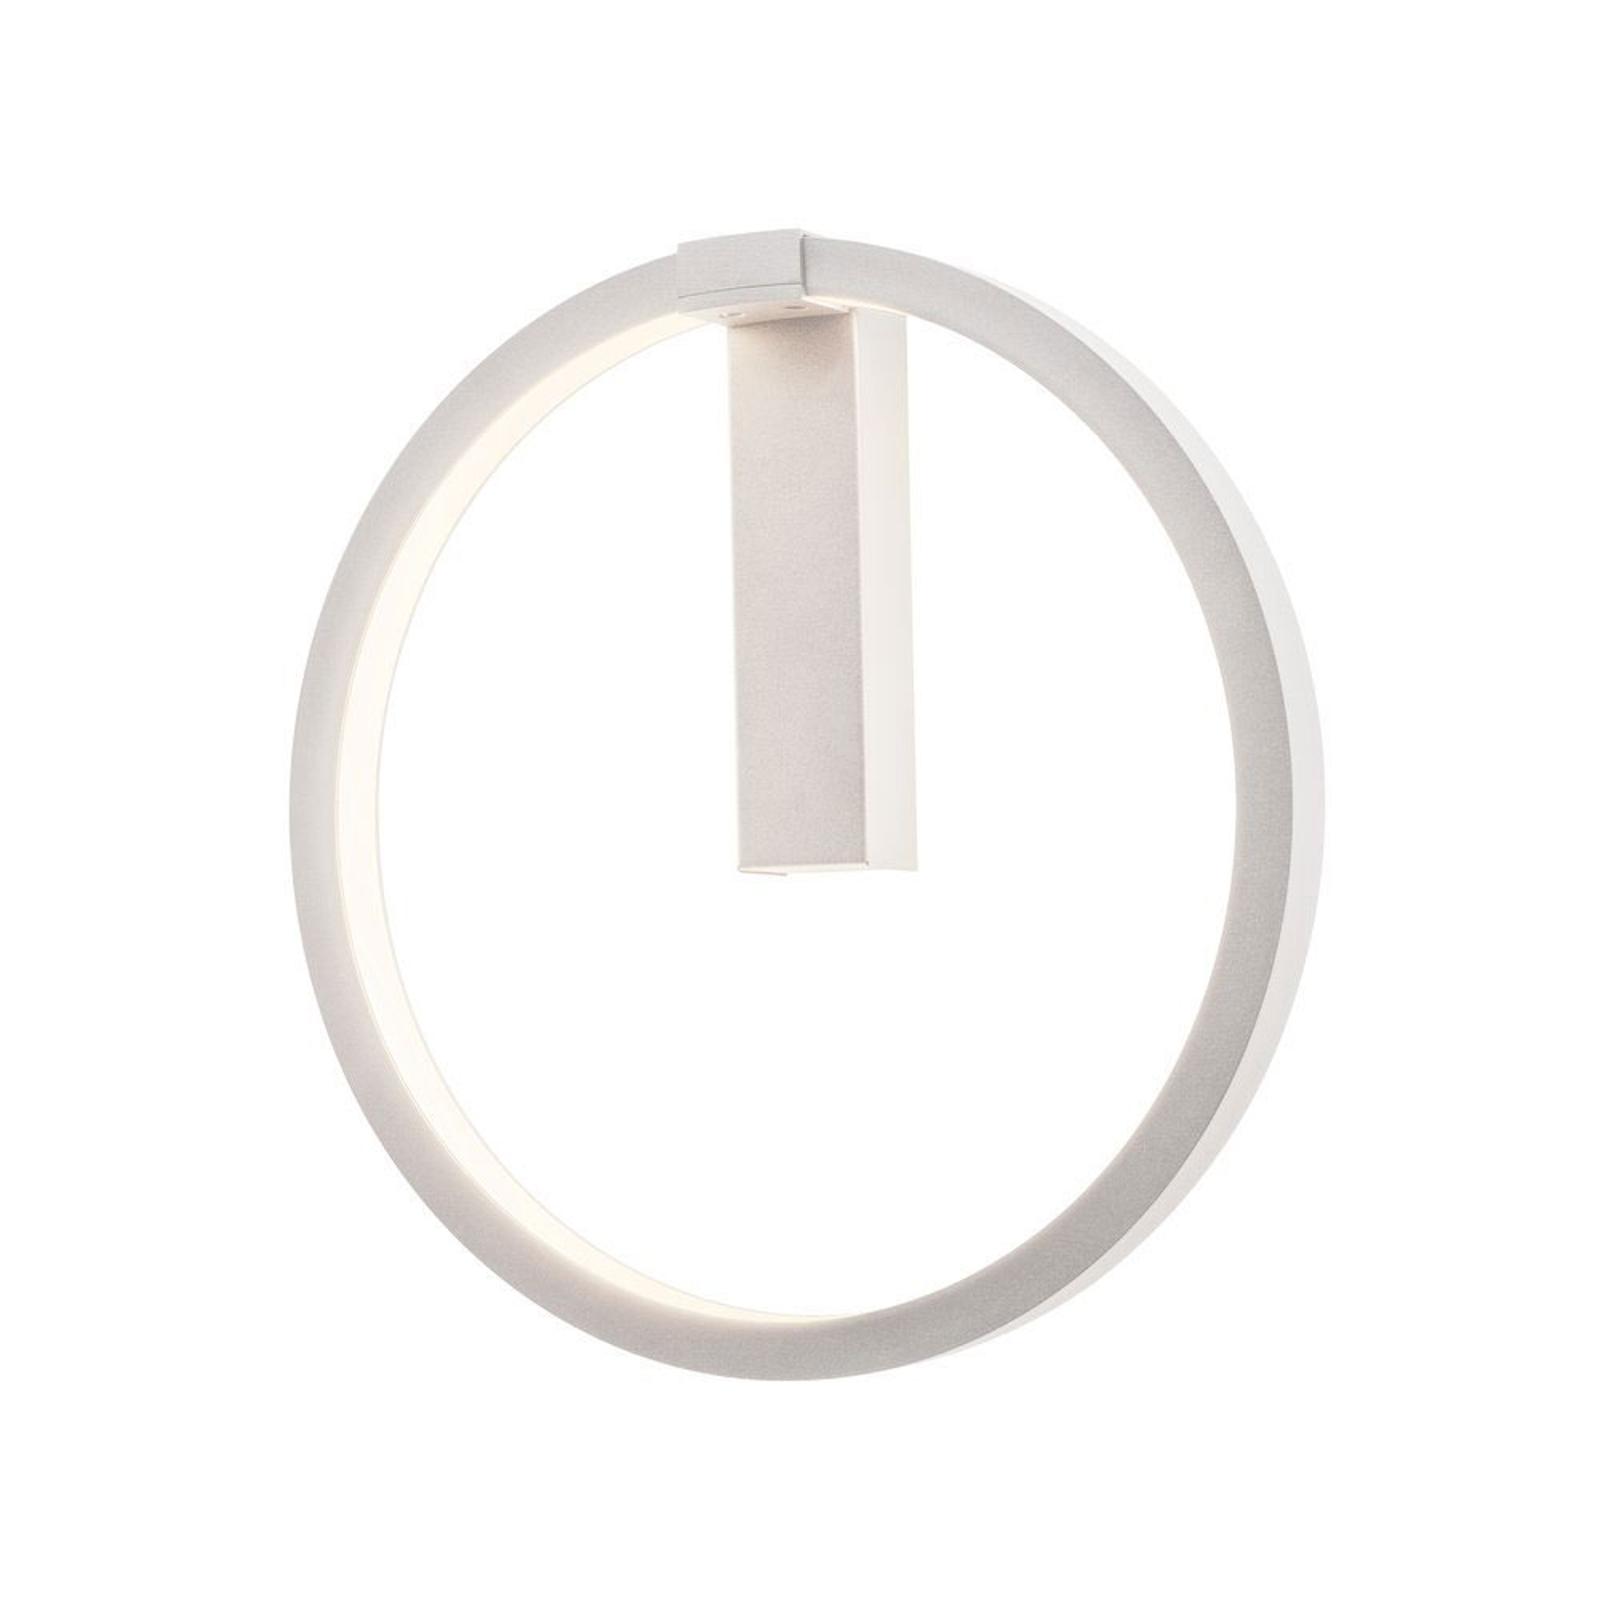 SLV One LED-Wandleuchte, DALI, weiß, Ø 40 cm